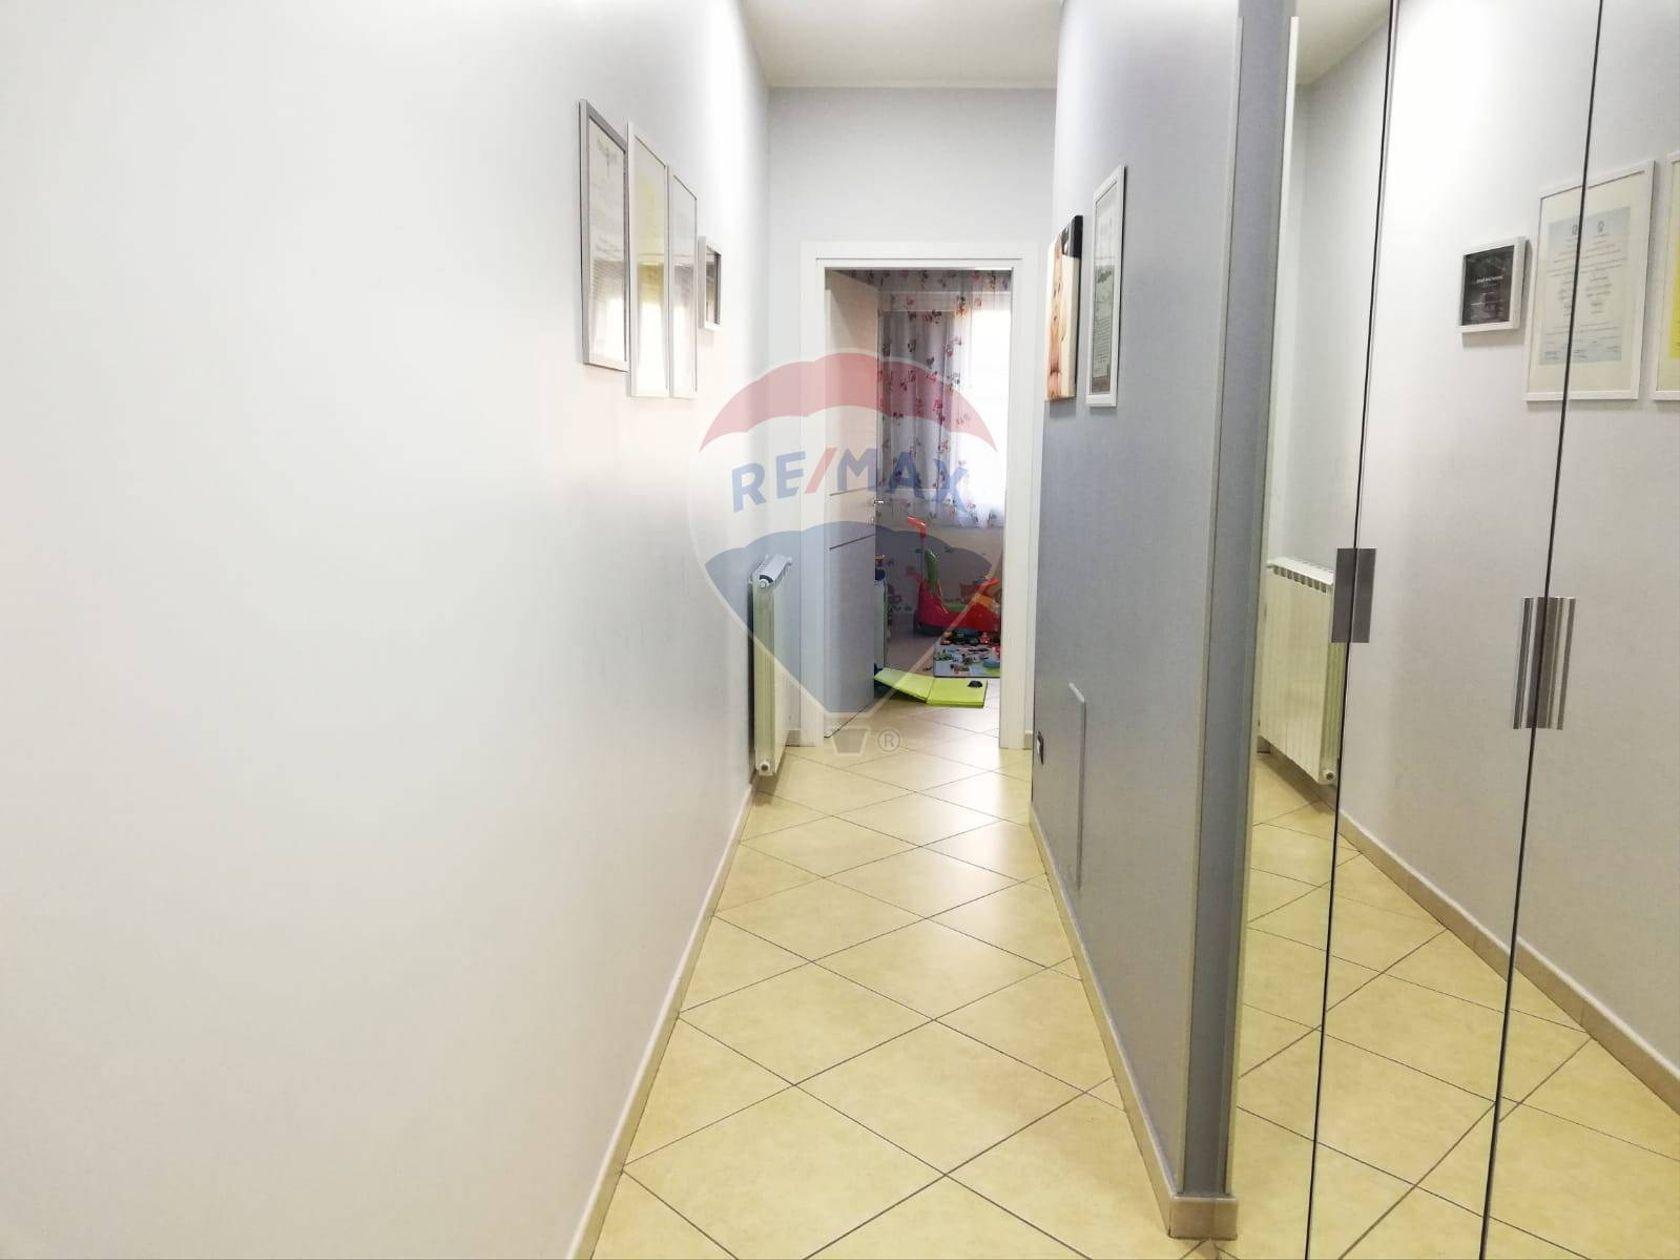 Appartamento Zona San Michele, Afragola, NA Vendita - Foto 4